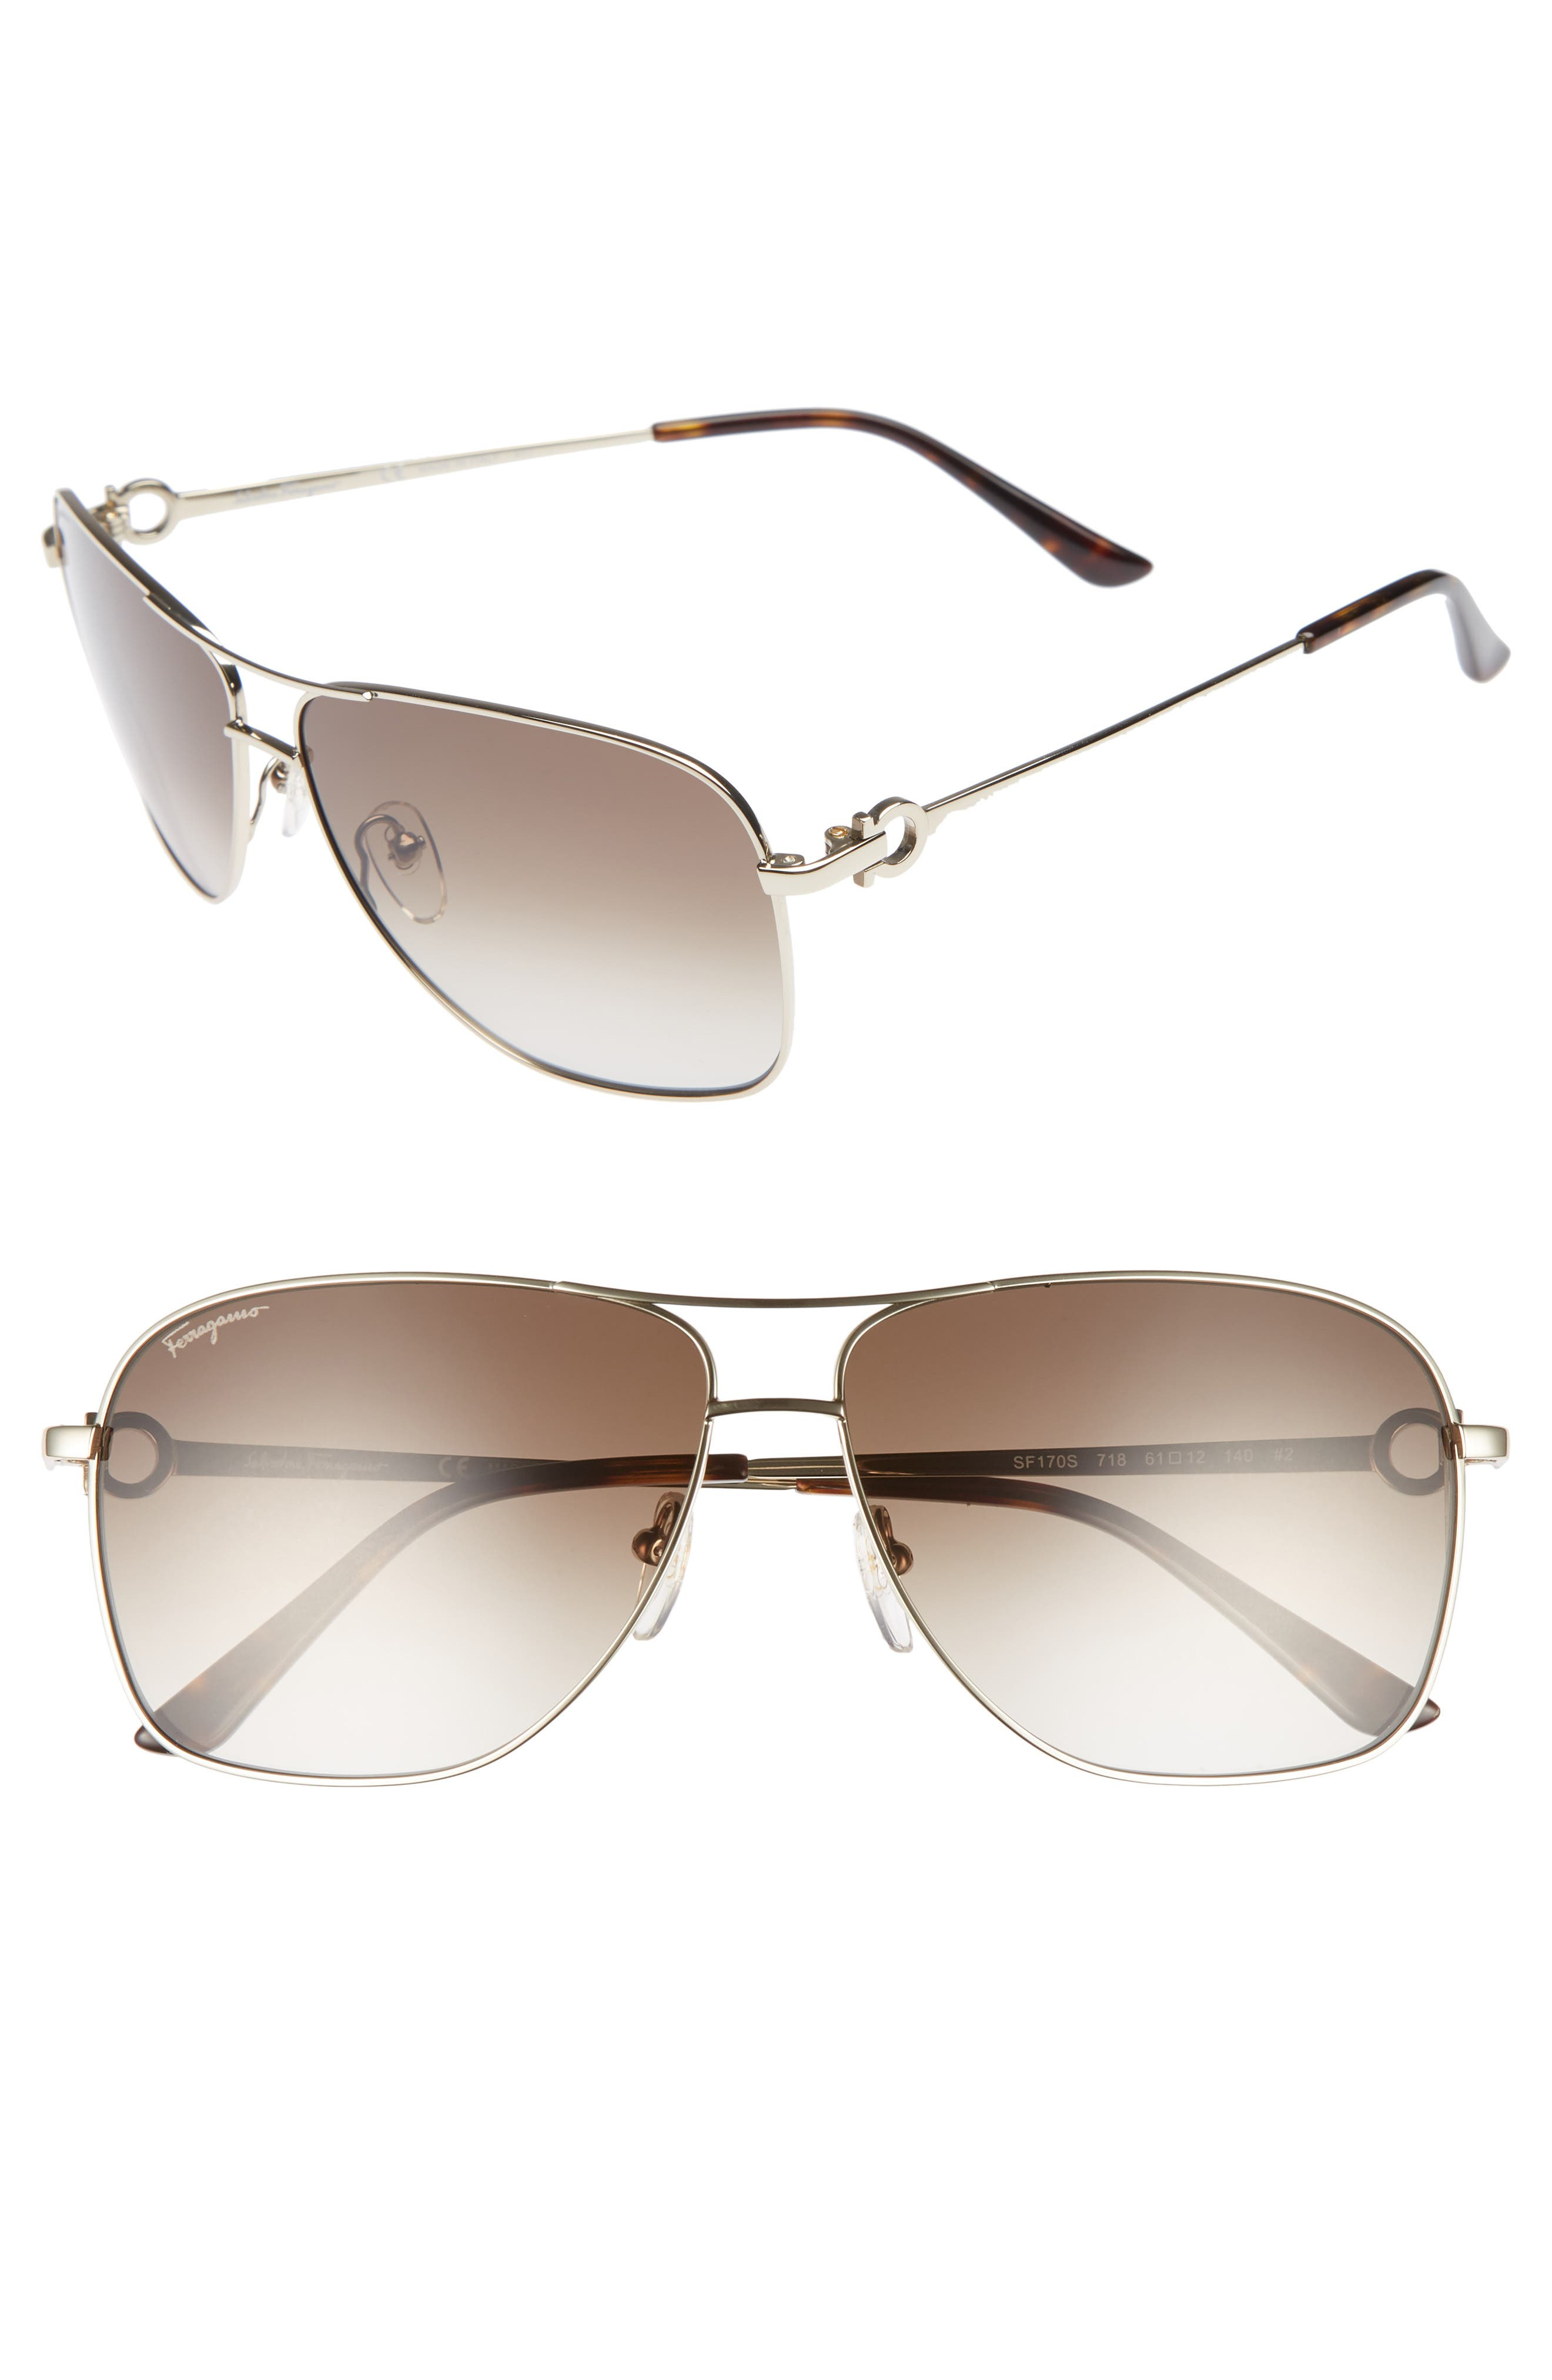 Gancio 61mm Aviator Sunglasses,                             Main thumbnail 1, color,                             SHINY GOLD